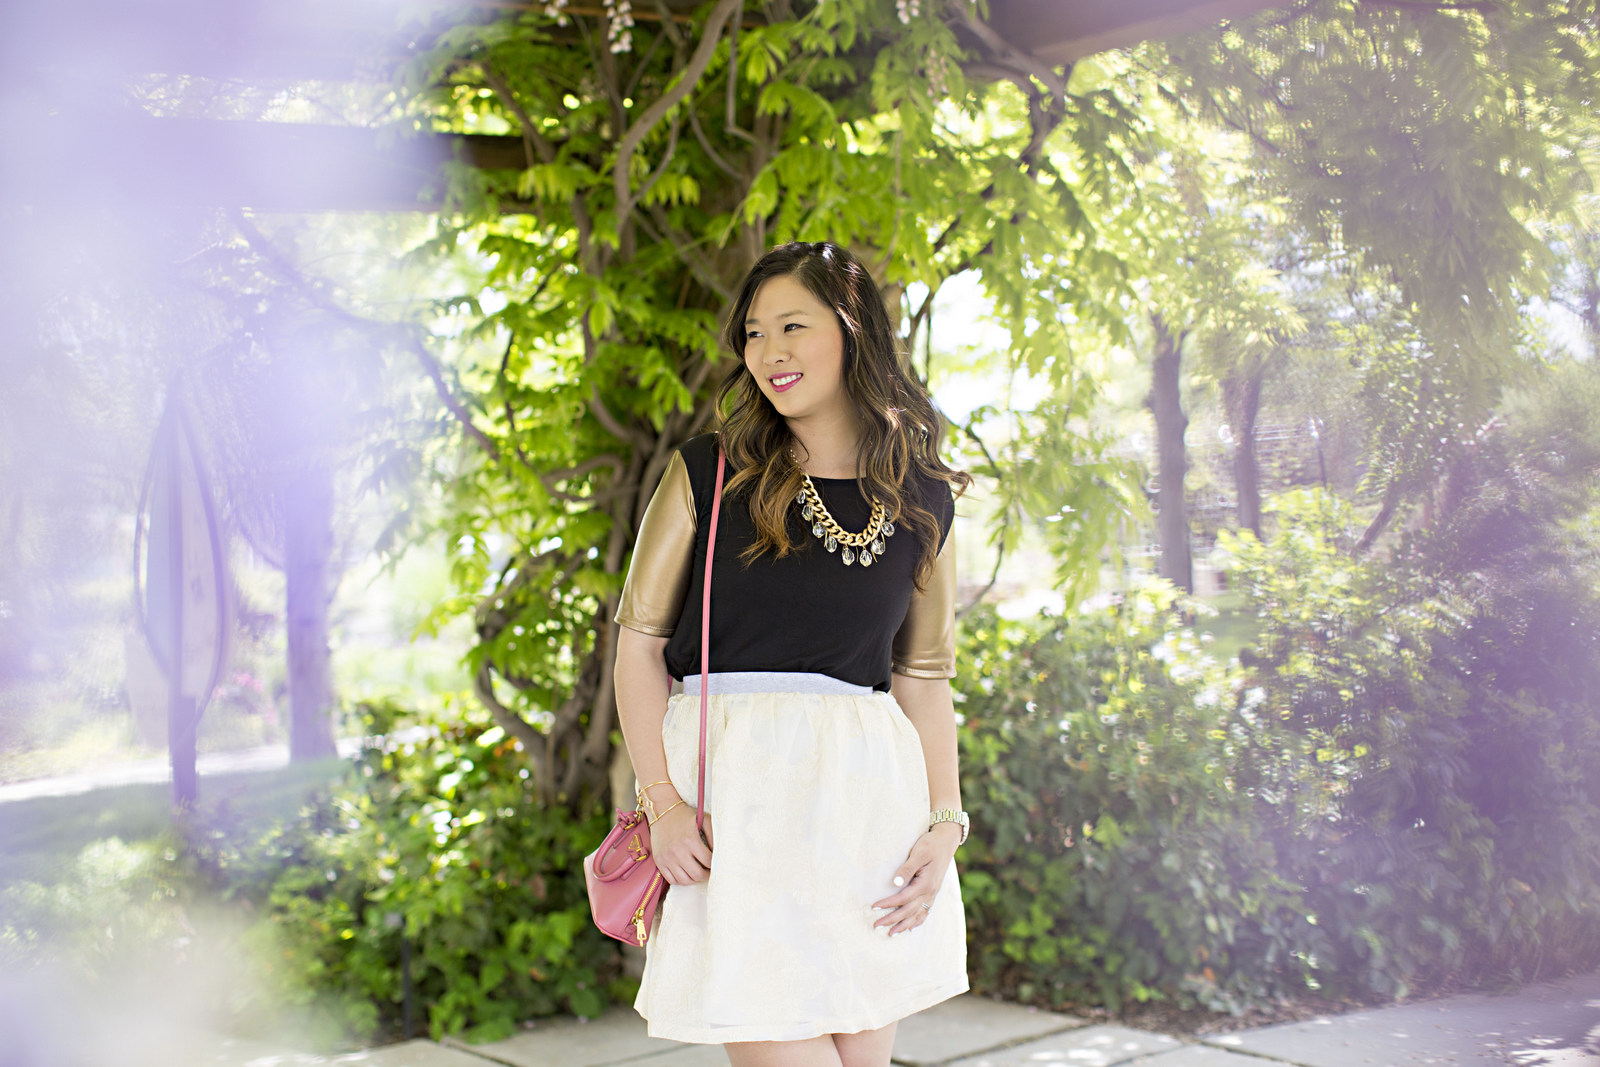 Sandy a la Mode | Fashion Blogger wearing Rhea Etcetera Skirt and Prada Bag